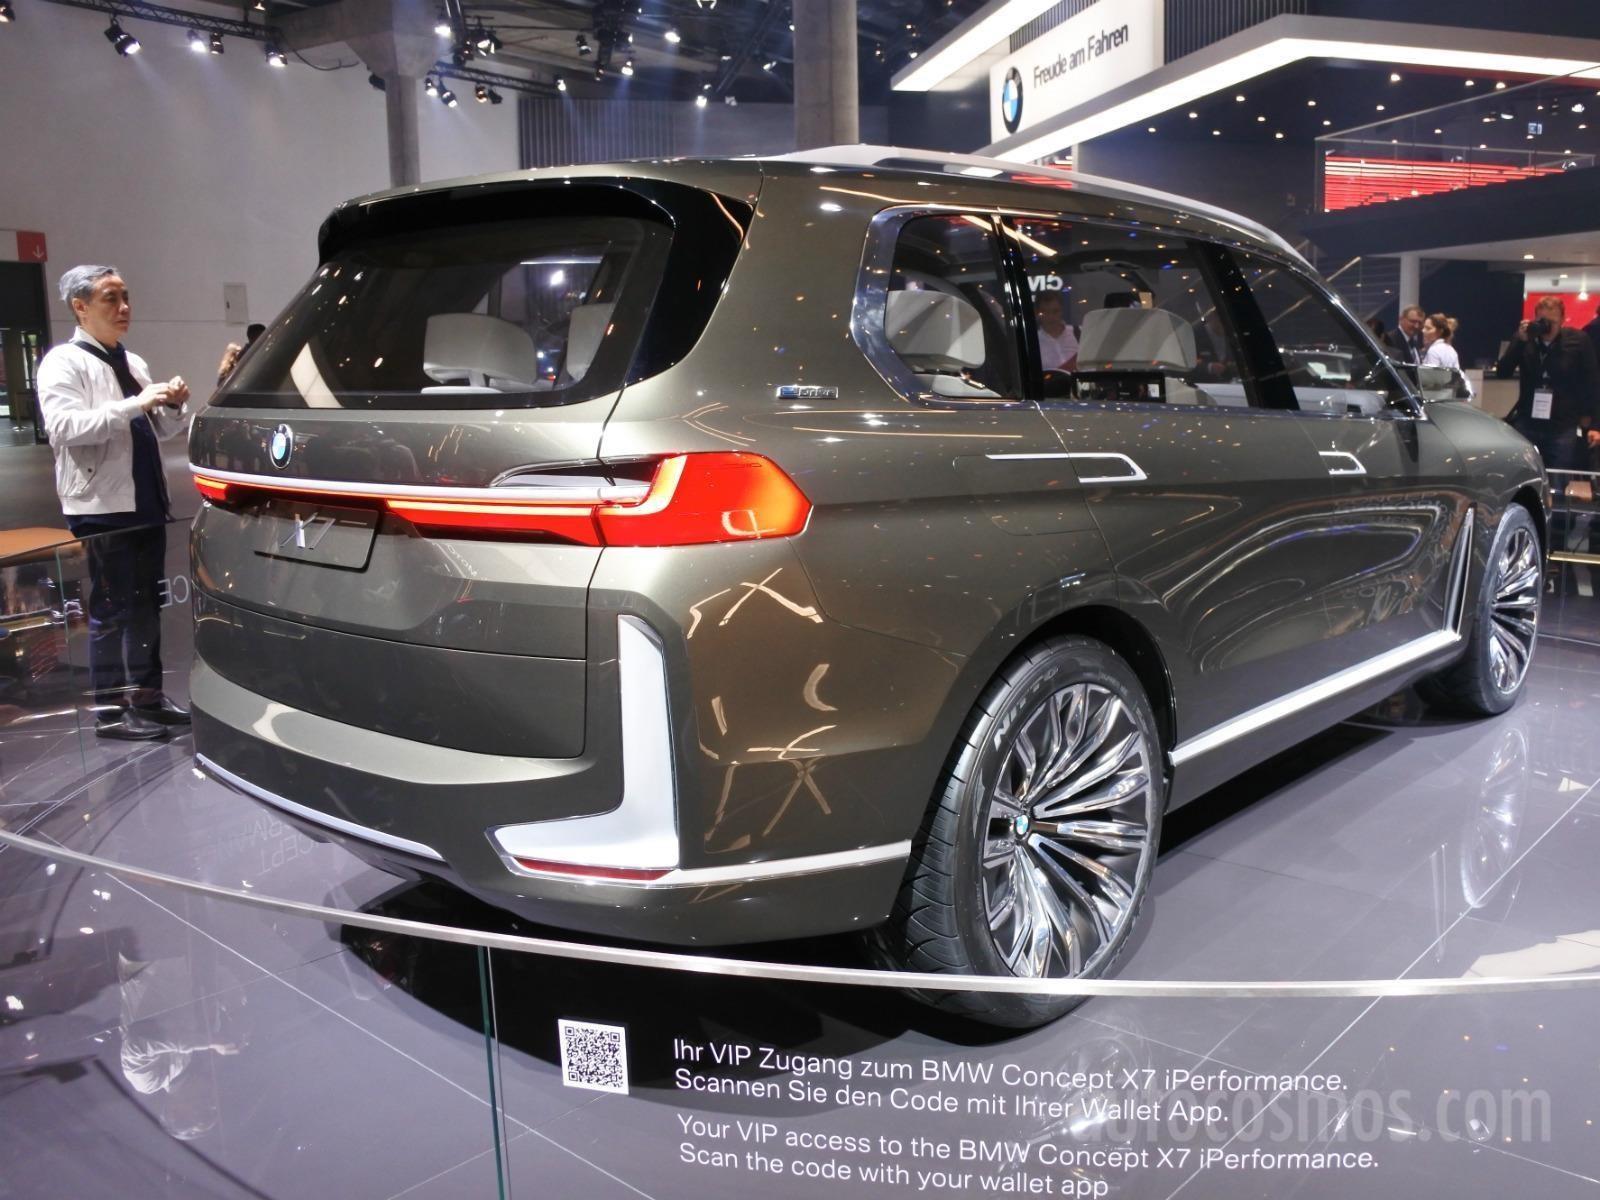 Auto Show de FrankFurt 2017 - BMW Concept X7 iPerformance - Noticias ...